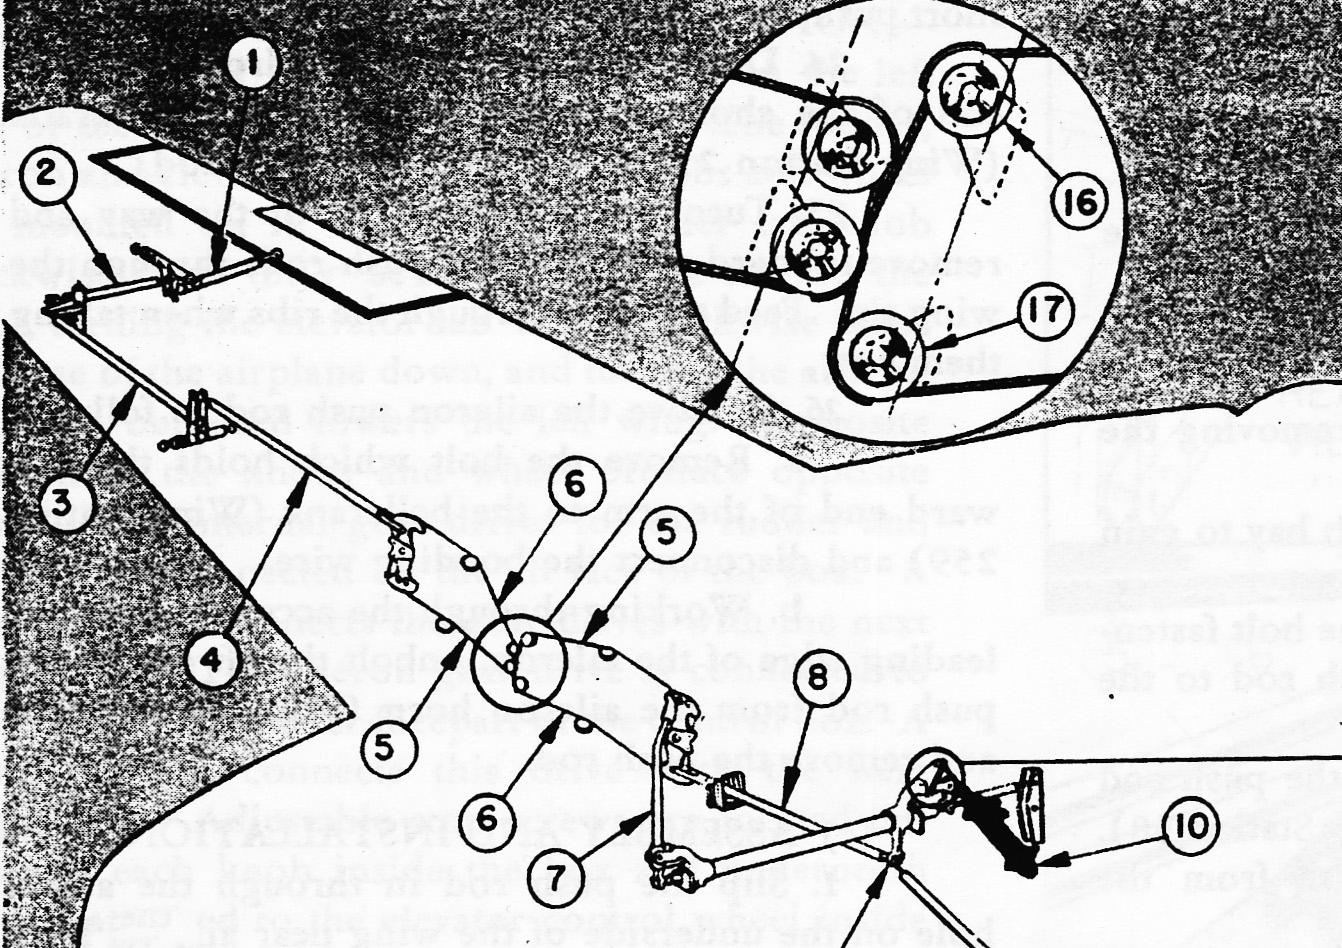 U.S. Navy Aircraft History: Grumman Sto-Wing Redux